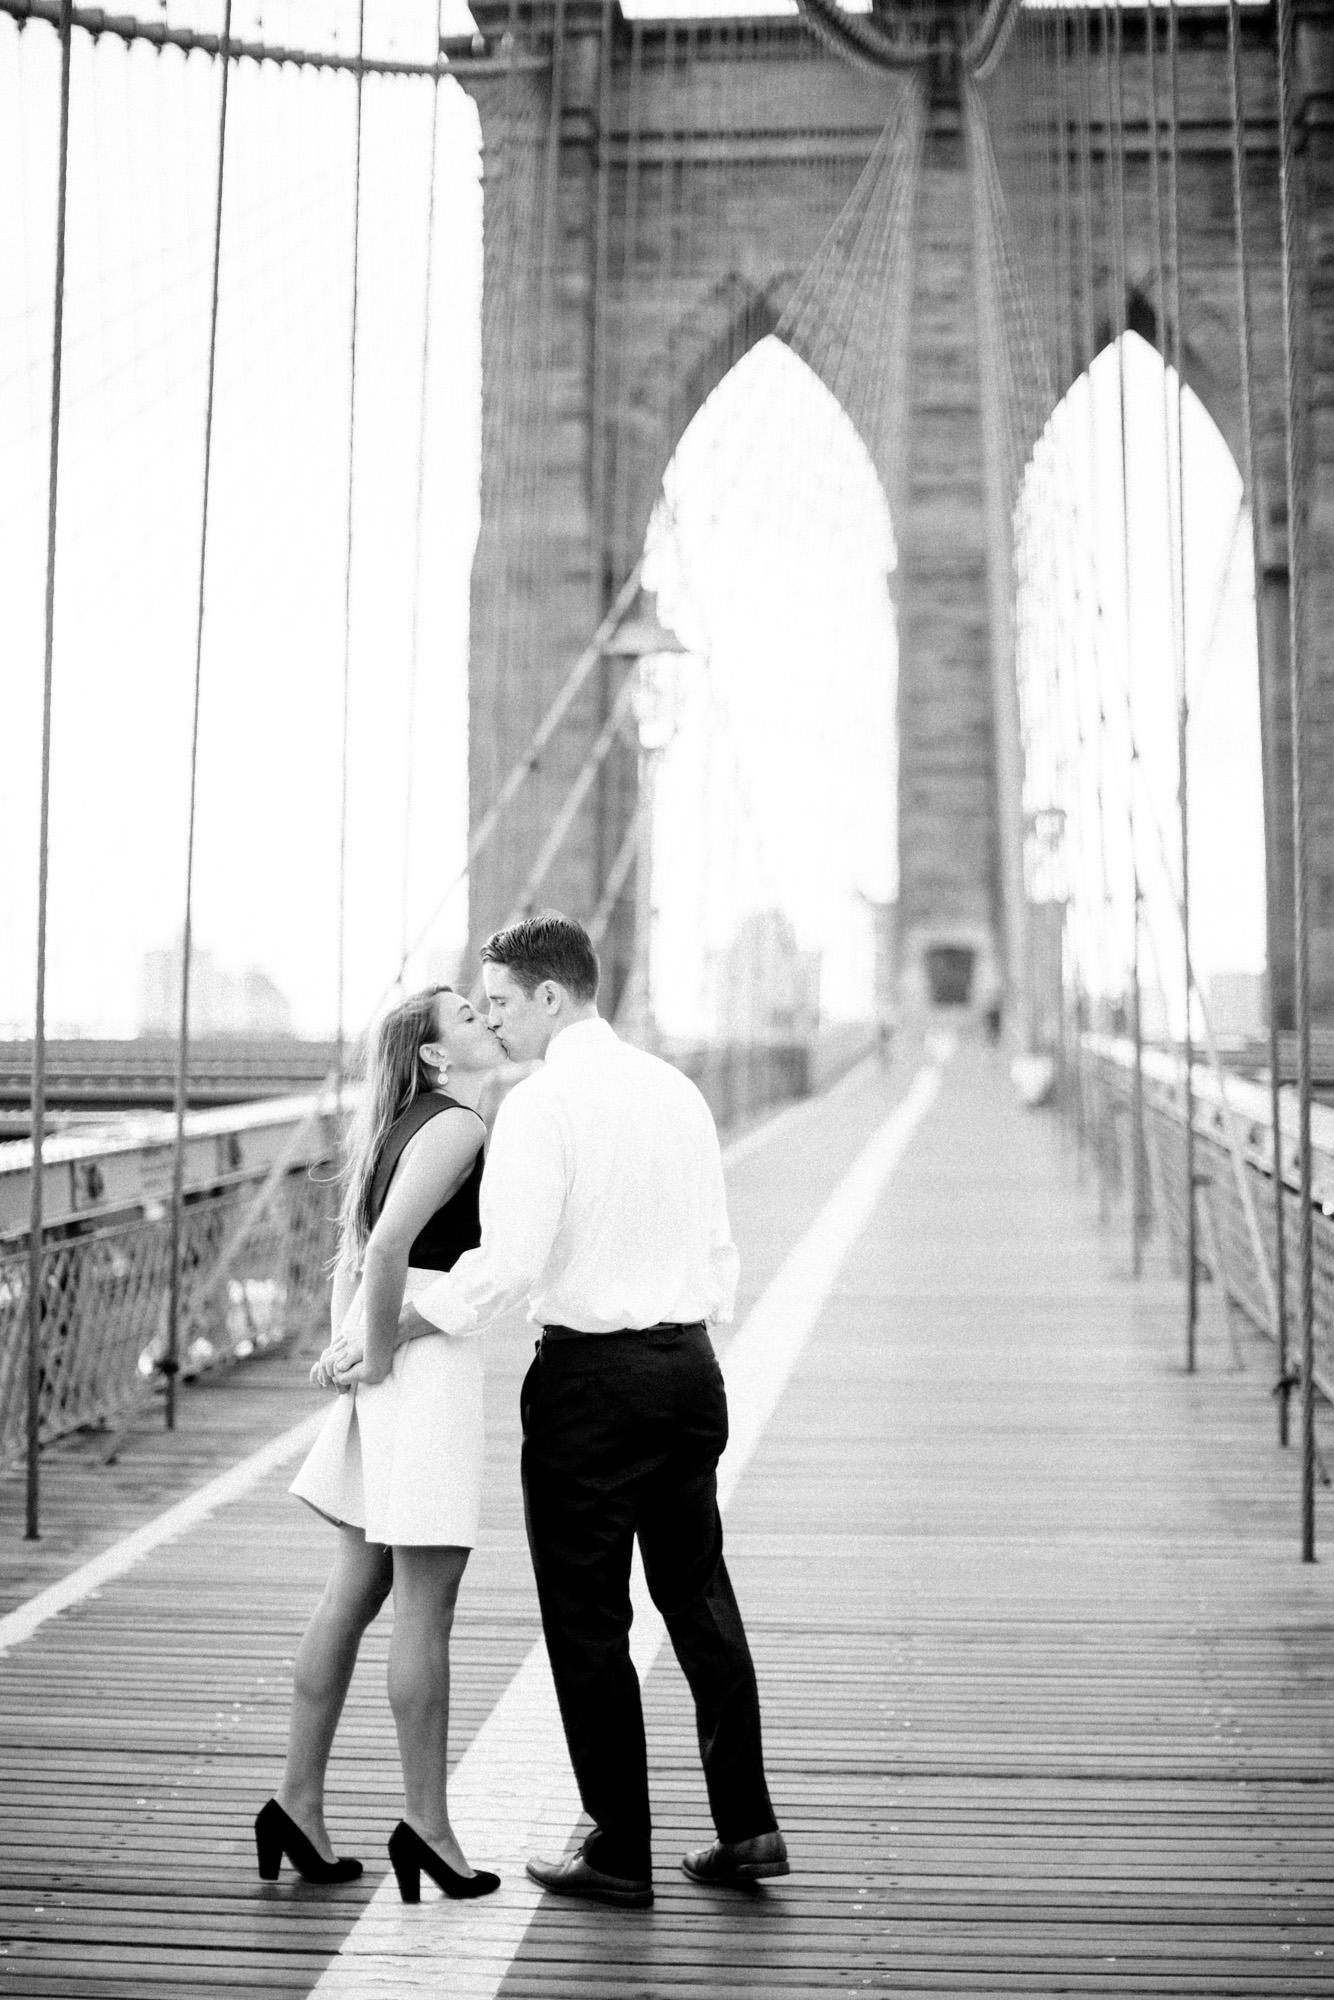 new-york-city-wedding-photography-hunter-ryan-photo-04658.jpg